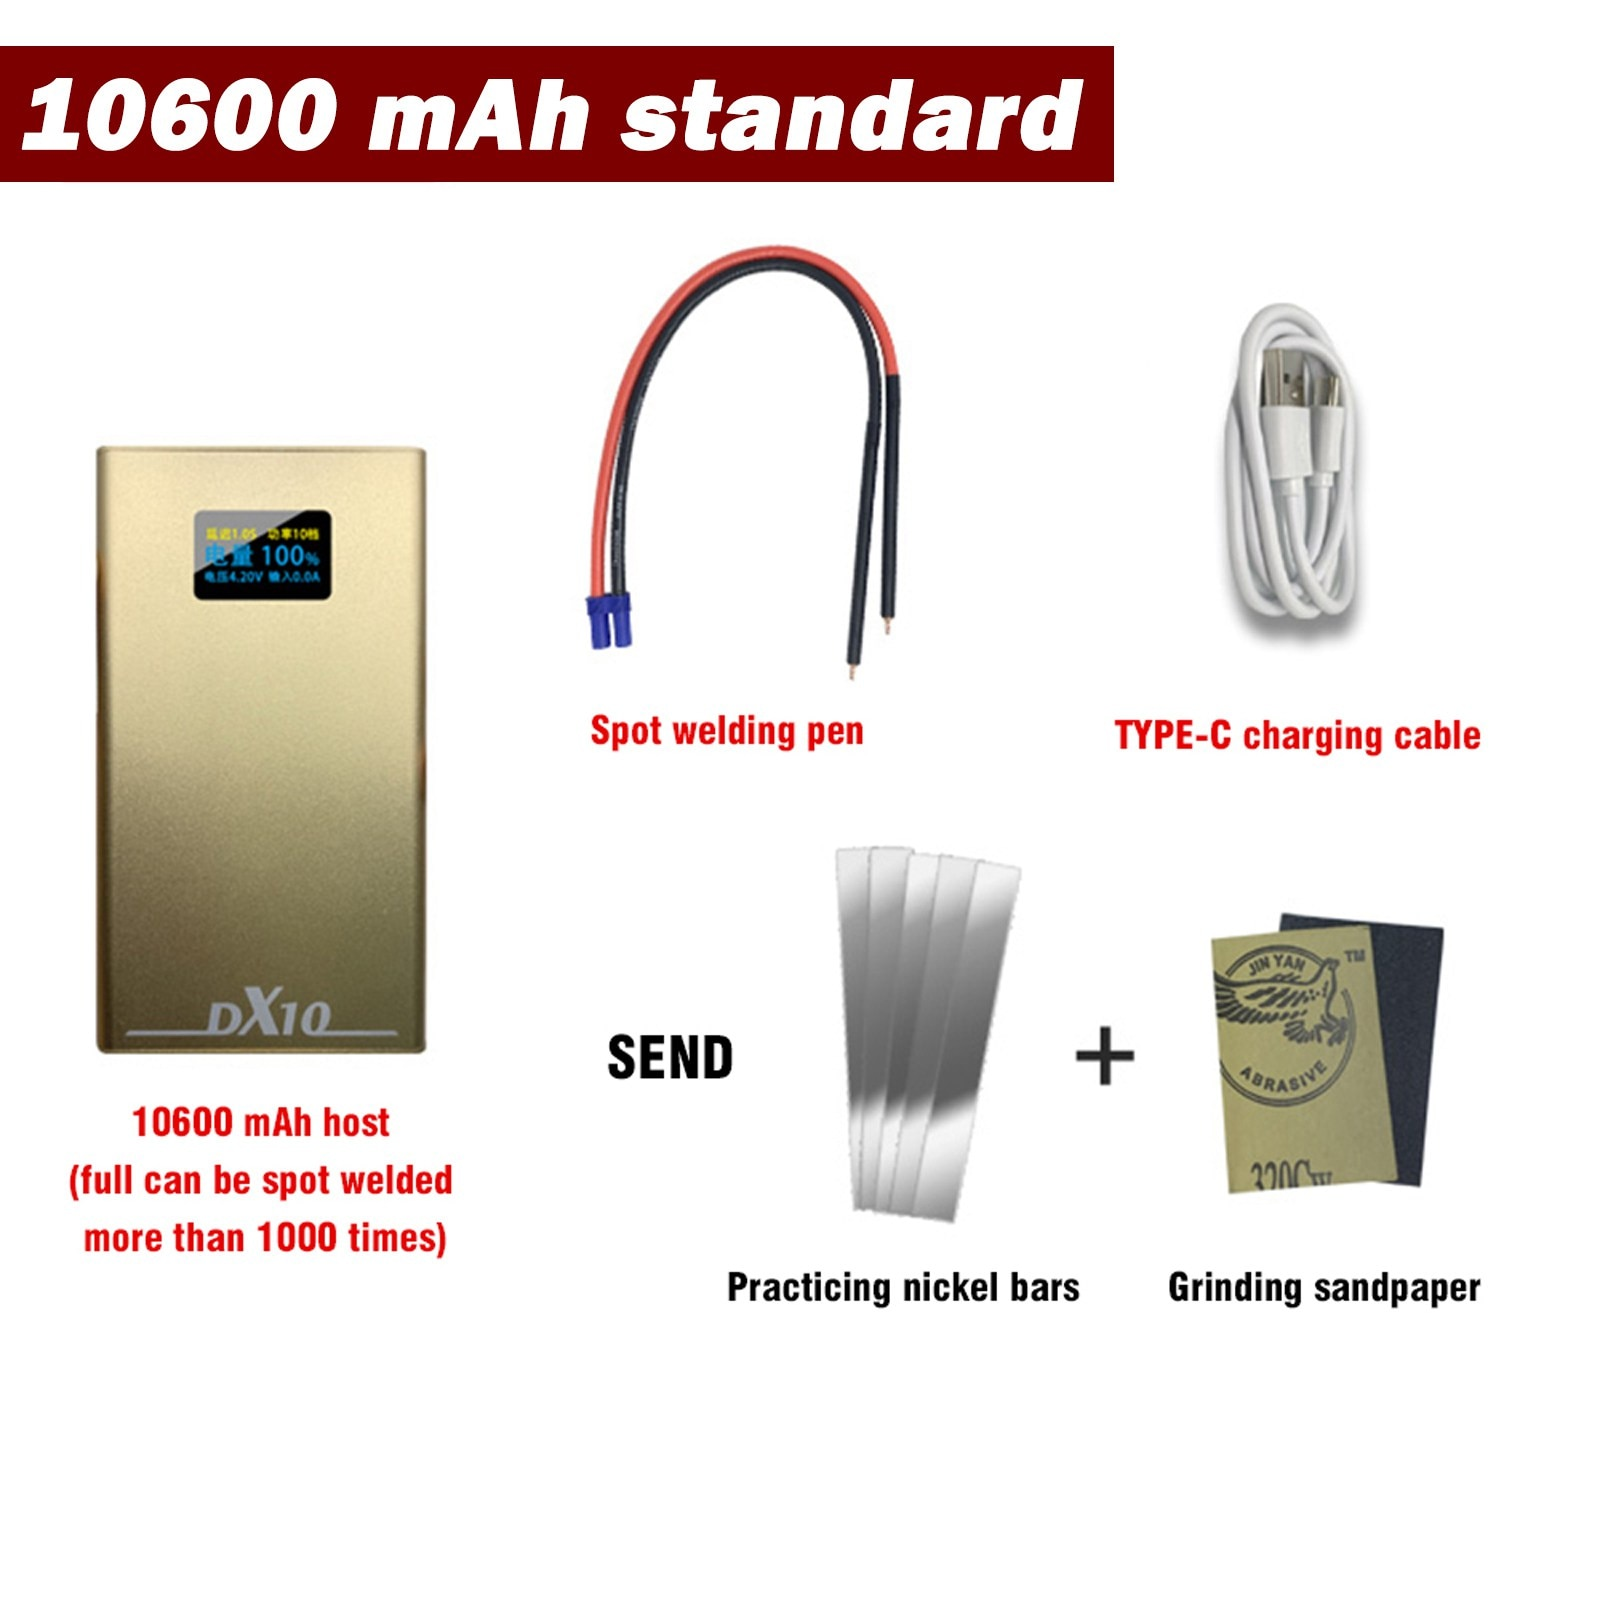 dx10-portatil-soldador-por-puntos-oled-ajustable-maquina-de-soldadura-por-puntos-de-bateria-soldador-herramientas-02-03mm-niquel-18650-8awg-punto-plumas